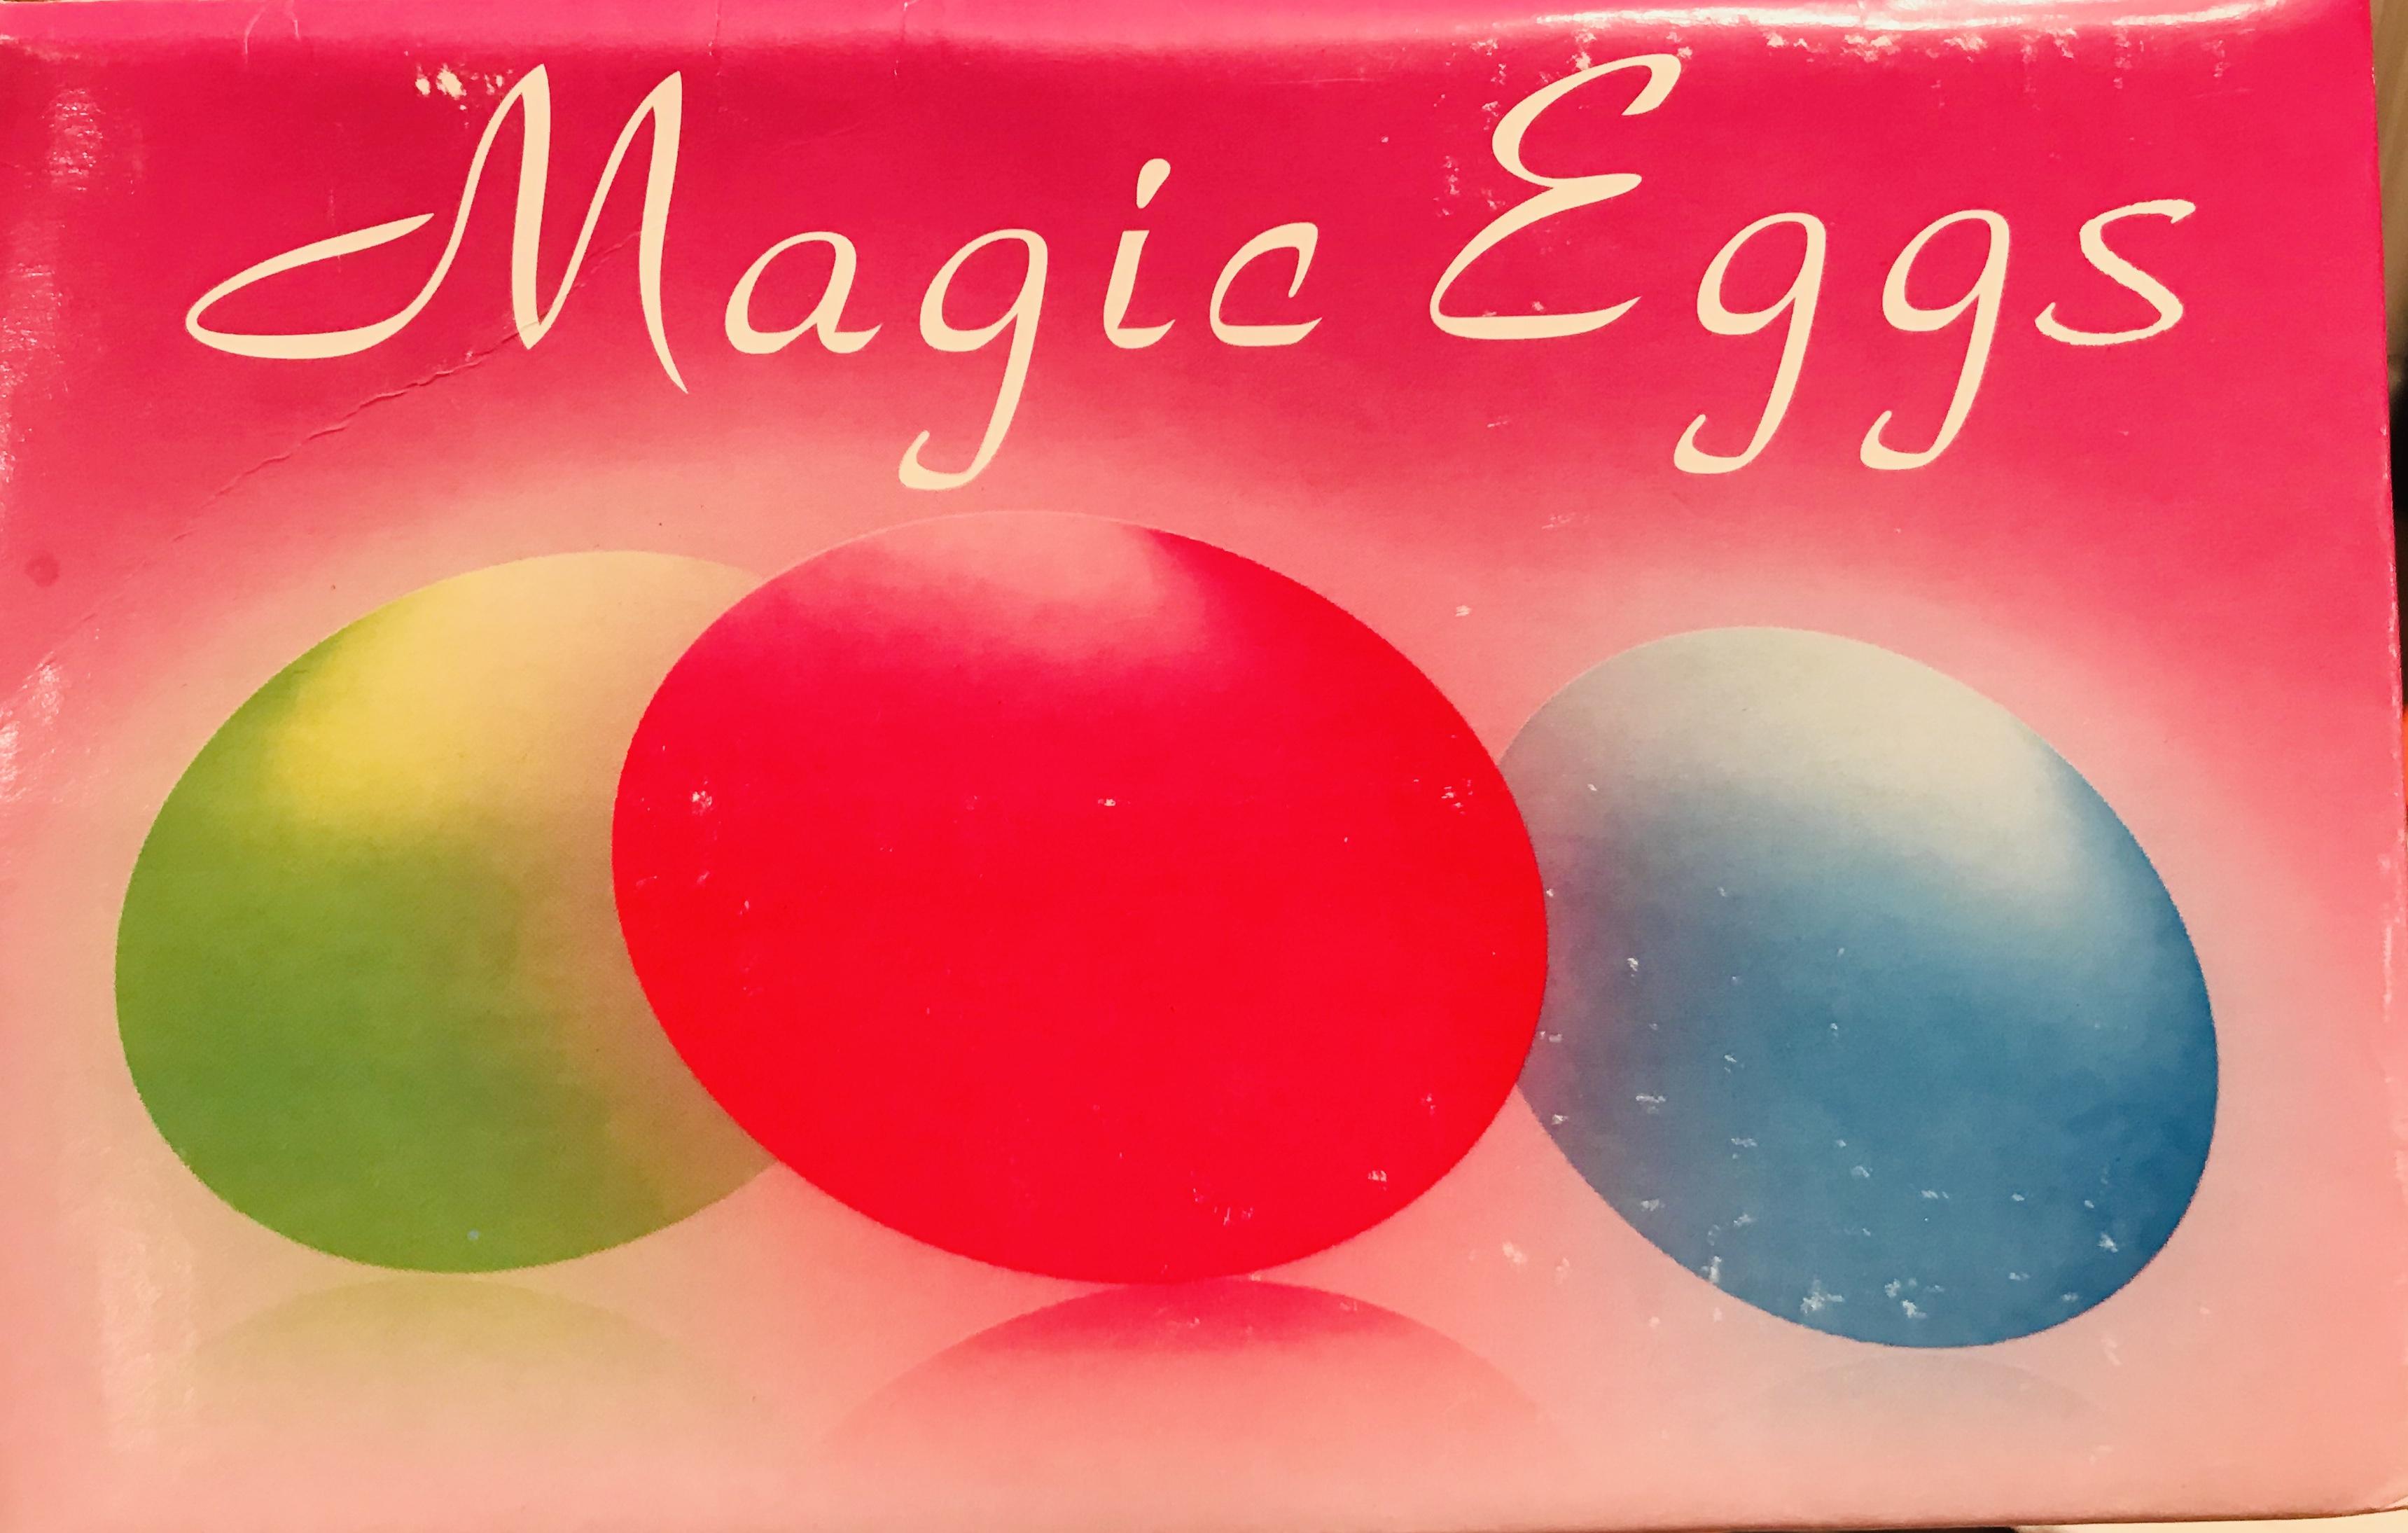 Magic eggs illustration